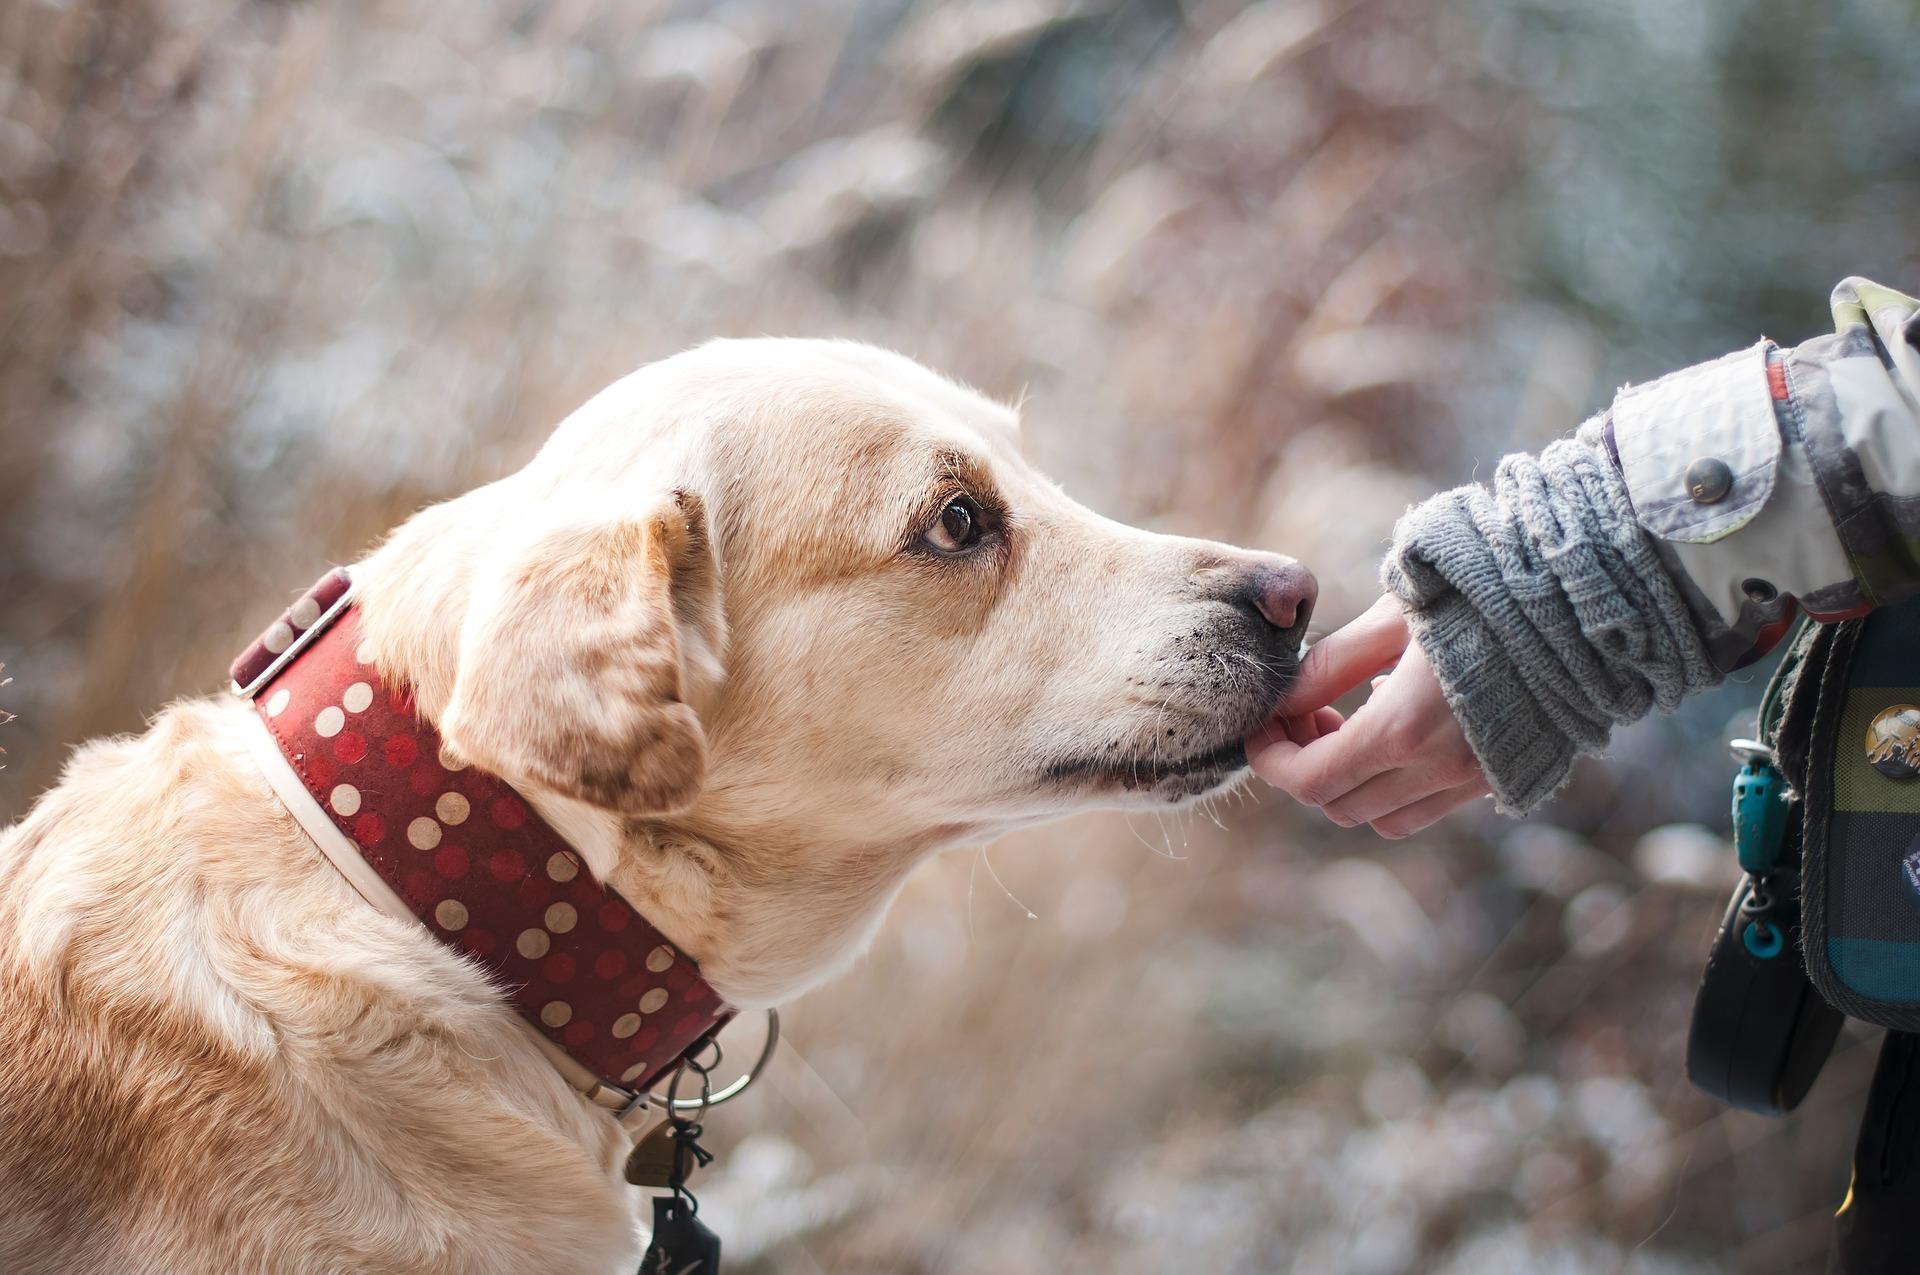 assicurare il cane da tartufi